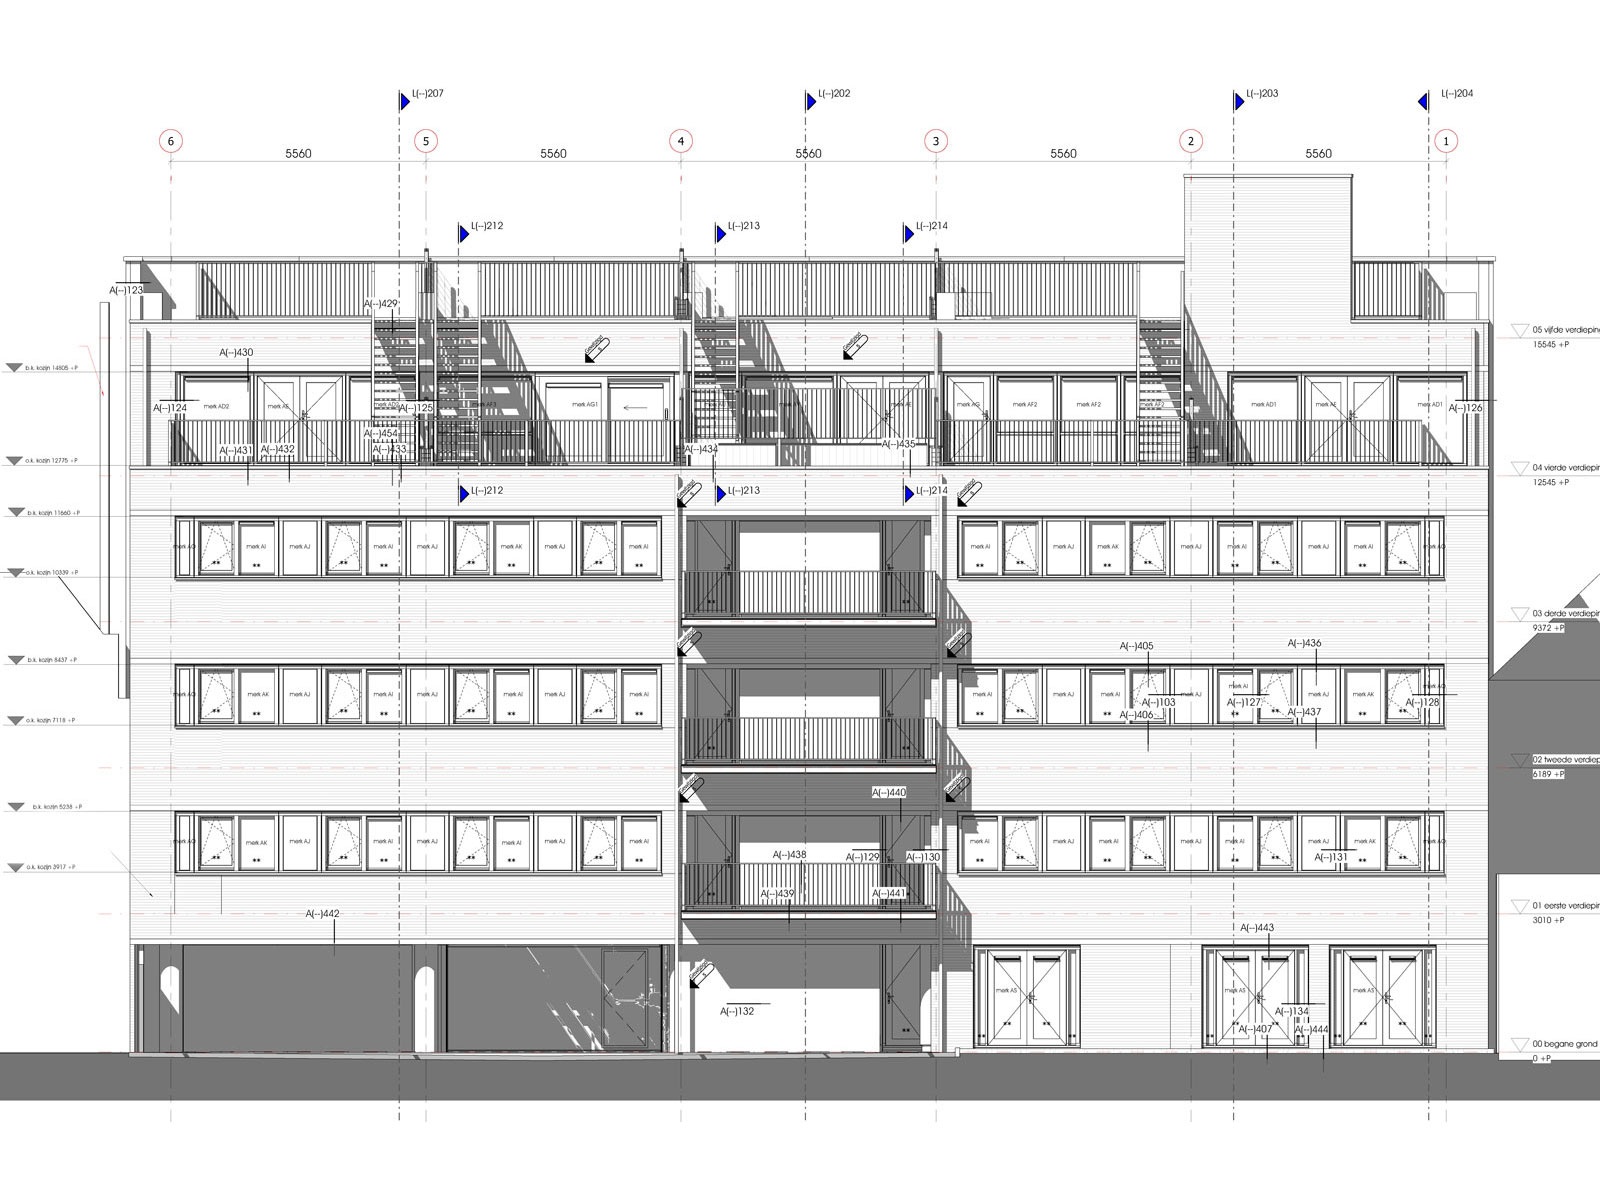 achtergevel - transformatie kantoor loftwoningen Noordsingel Rotterdam